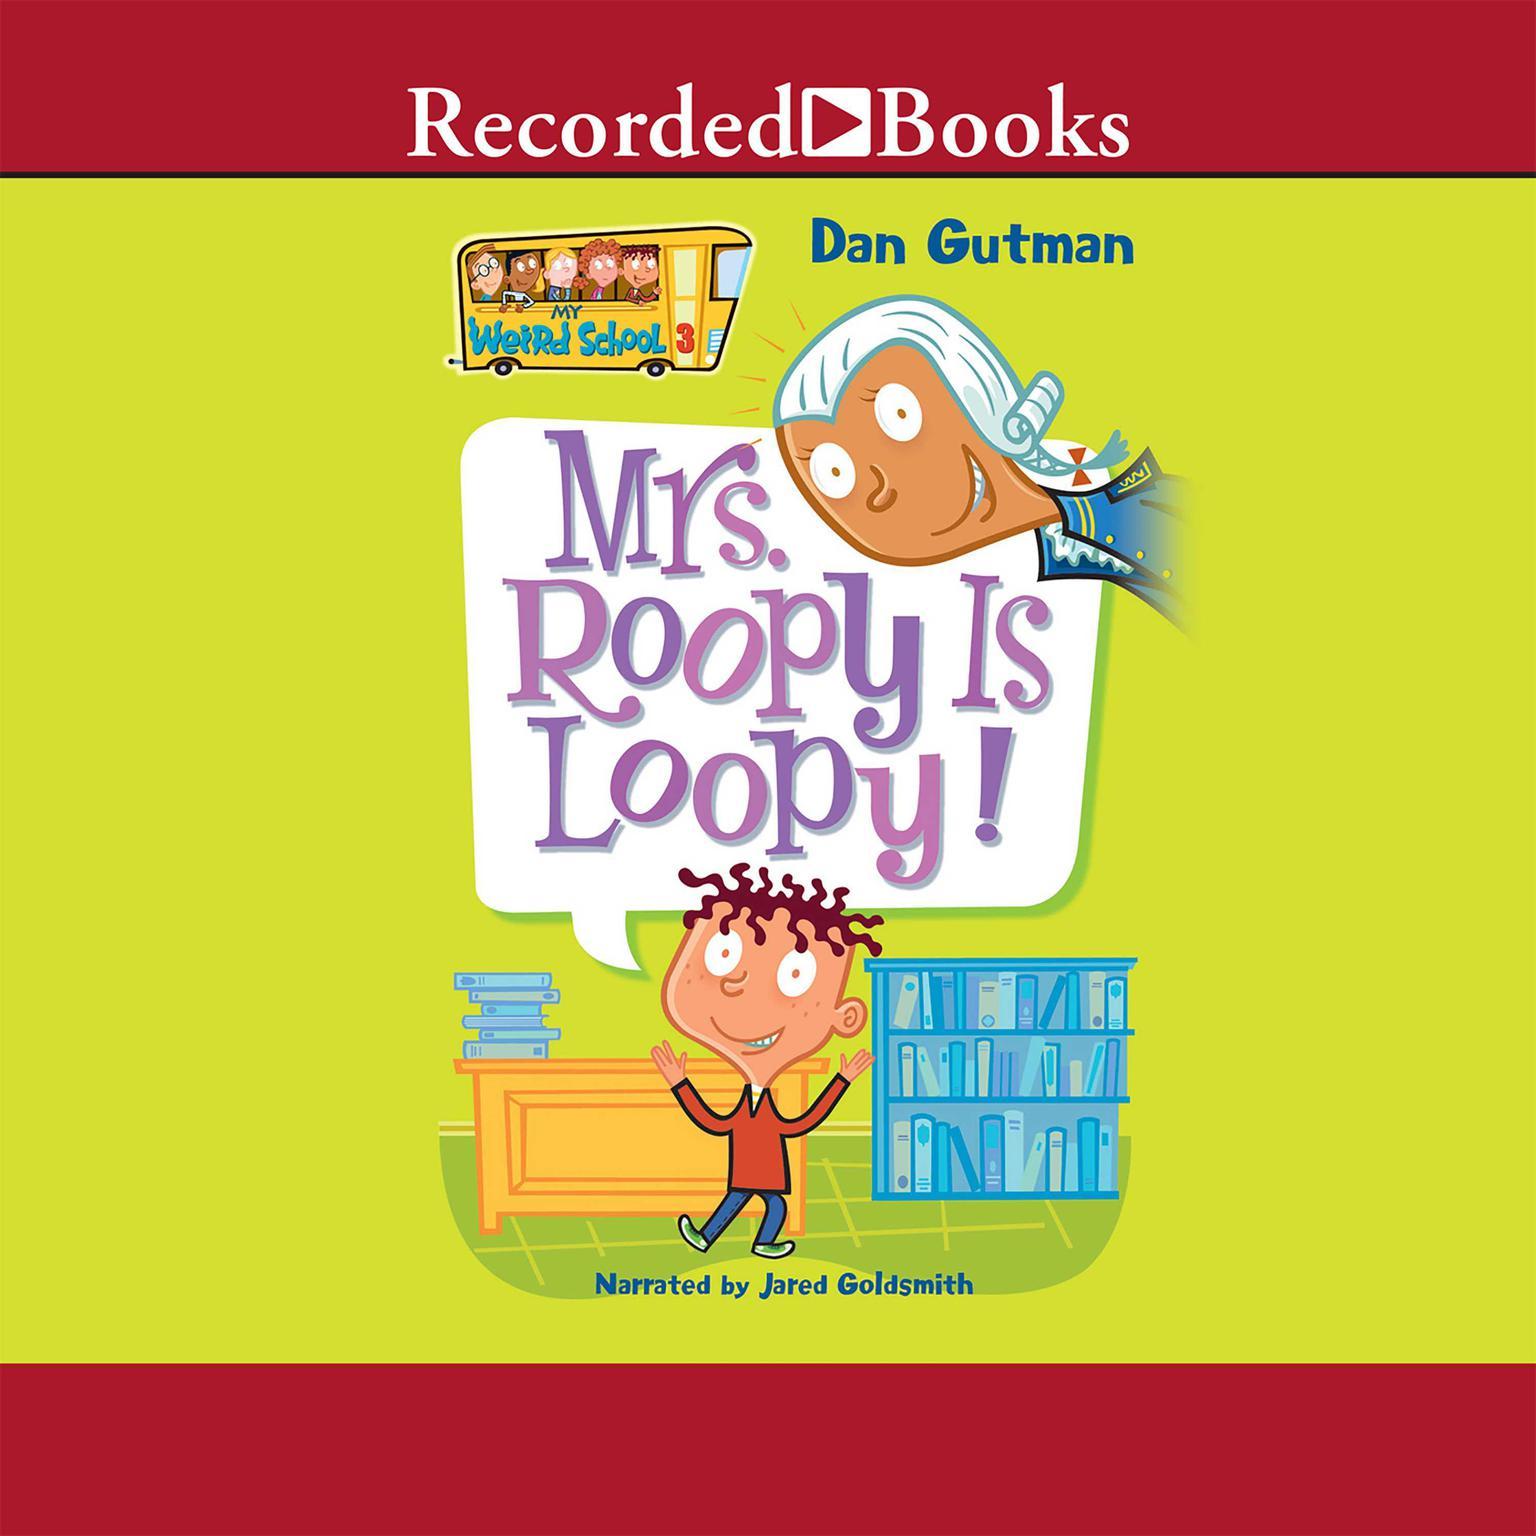 Mrs. Roopy Is Loopy! Audiobook, by Dan Gutman